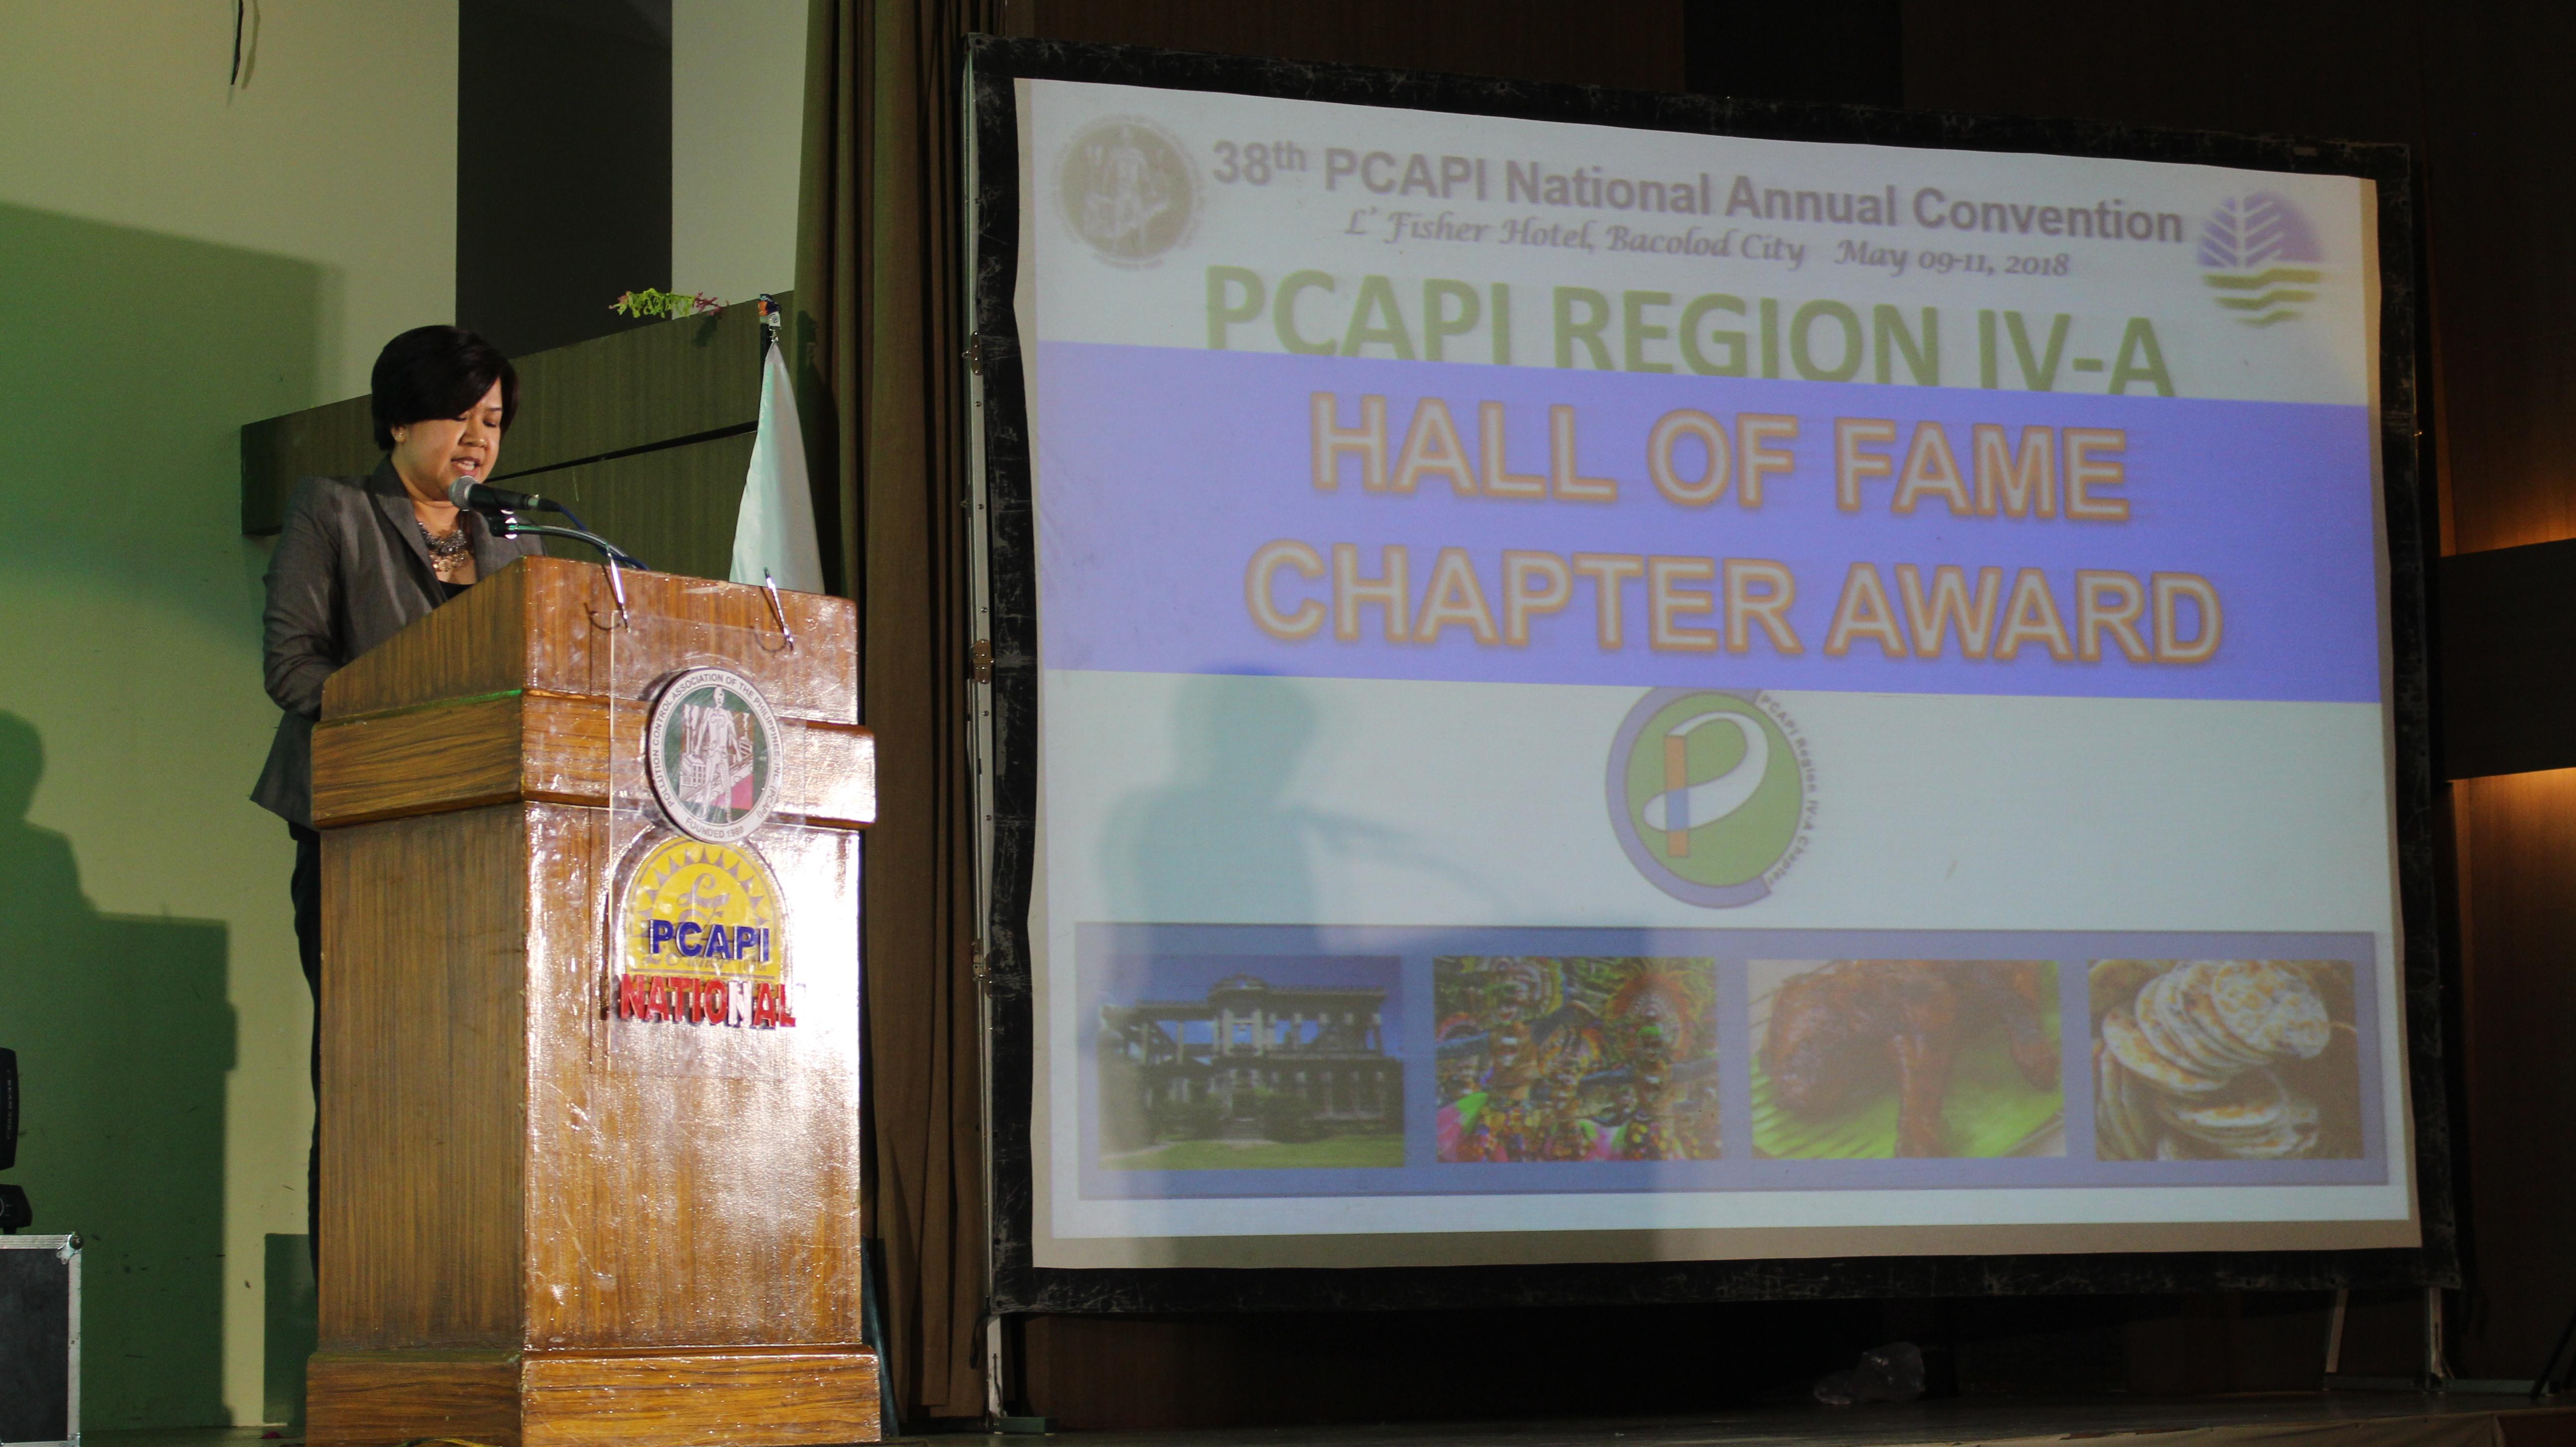 Hall of Fame Awardee